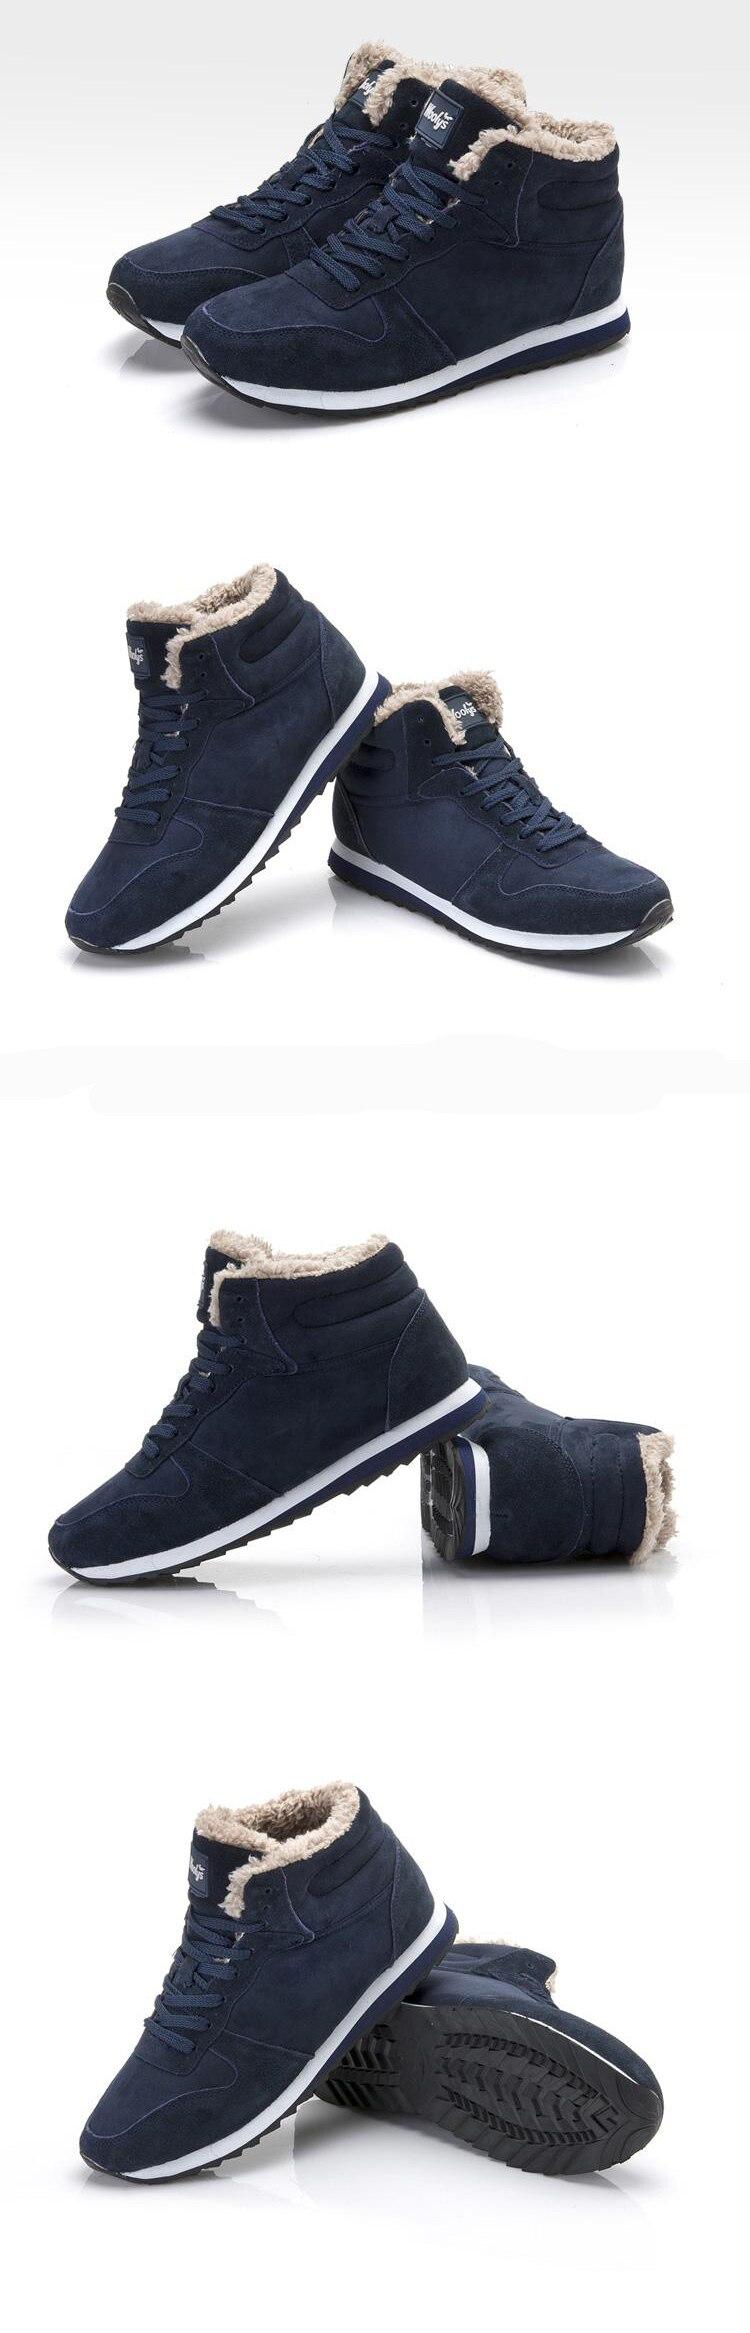 New Couple Unisex Super Warm Man Boot Fashion Men Winter Snow Boots Keep Warm Boots Plush Ankle Work Shoes Men Snow Boots 36-48 23